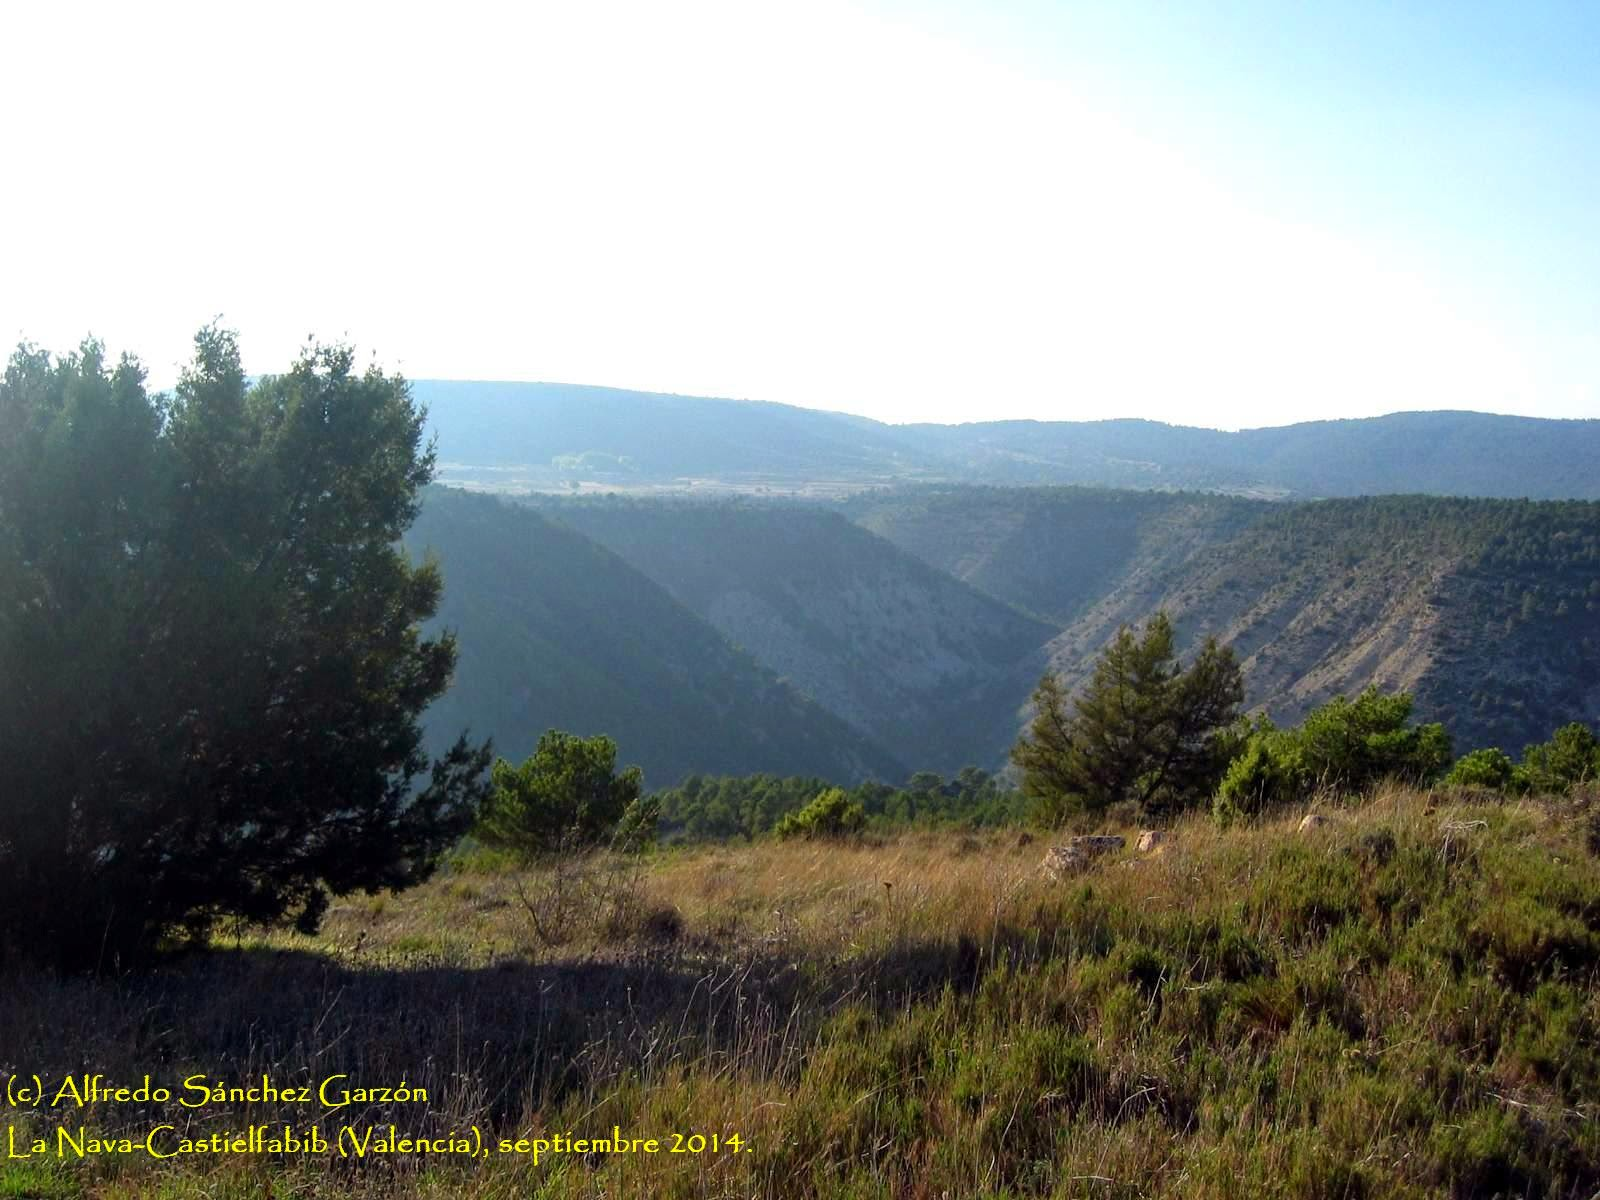 cerro-morrita-barranco-arroyo-cerezo